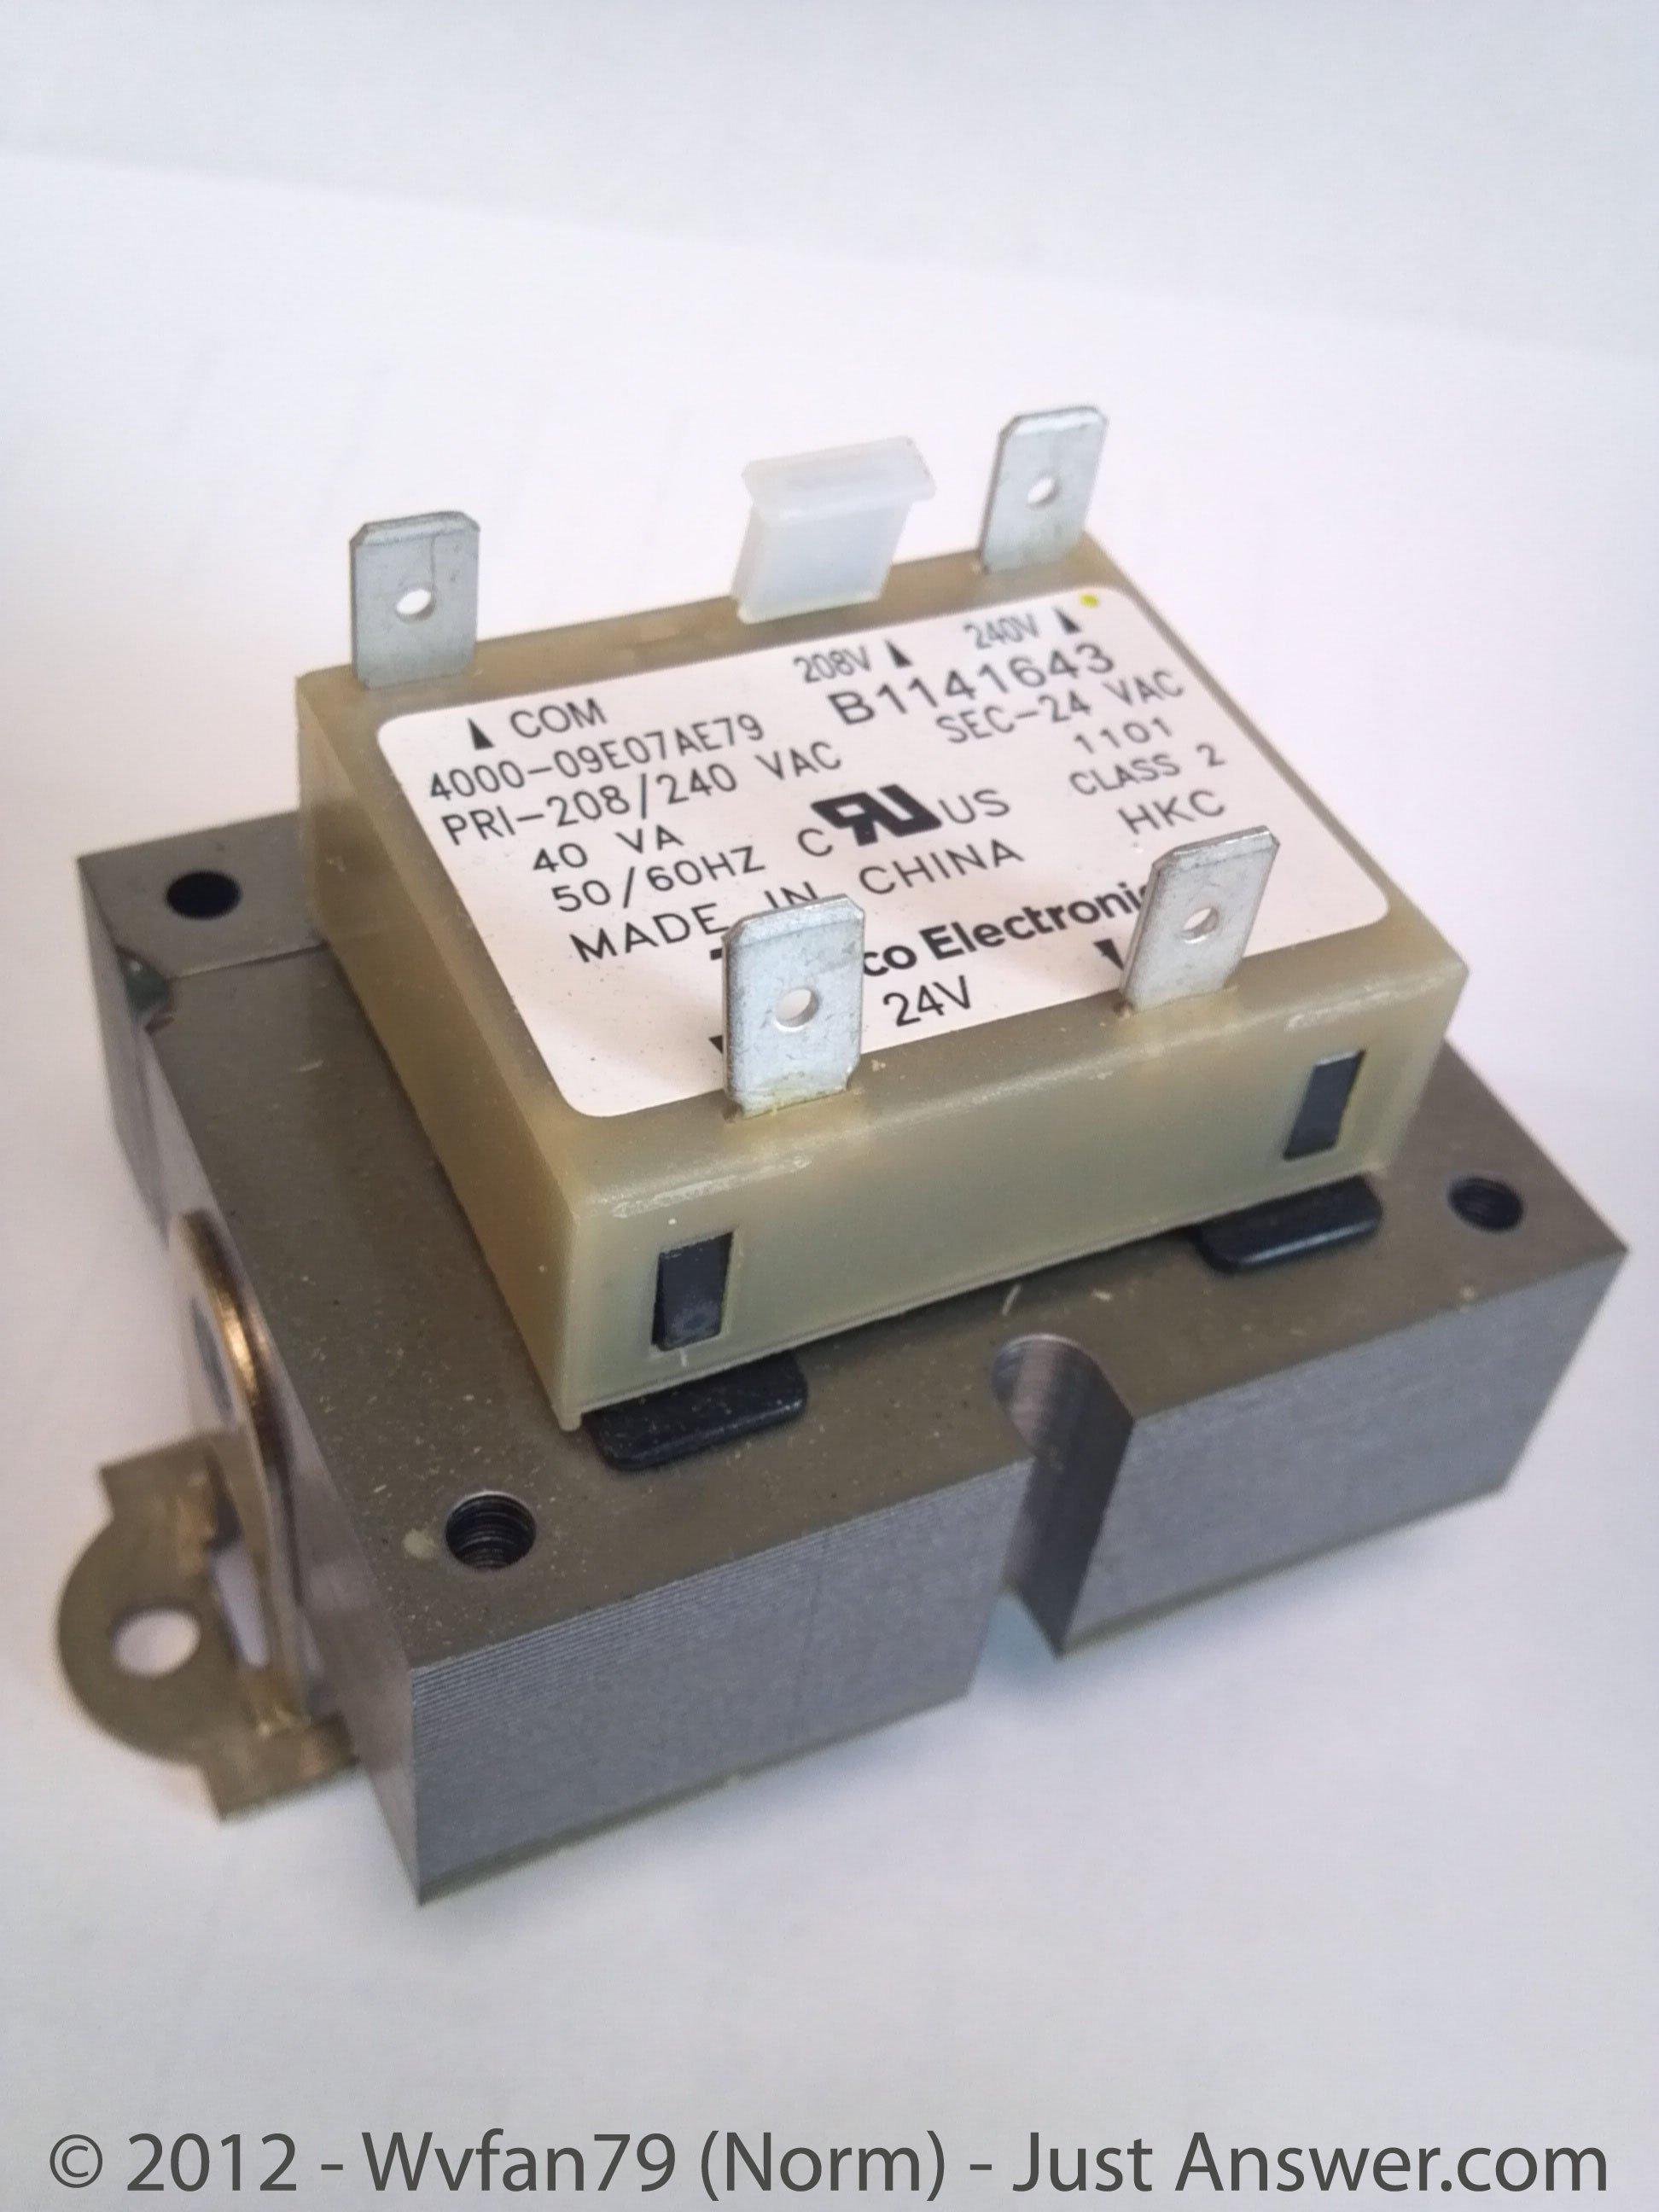 I Have A Rheem RGPJ 10EBRJR Gas Furnace With A 1012 925a IFC